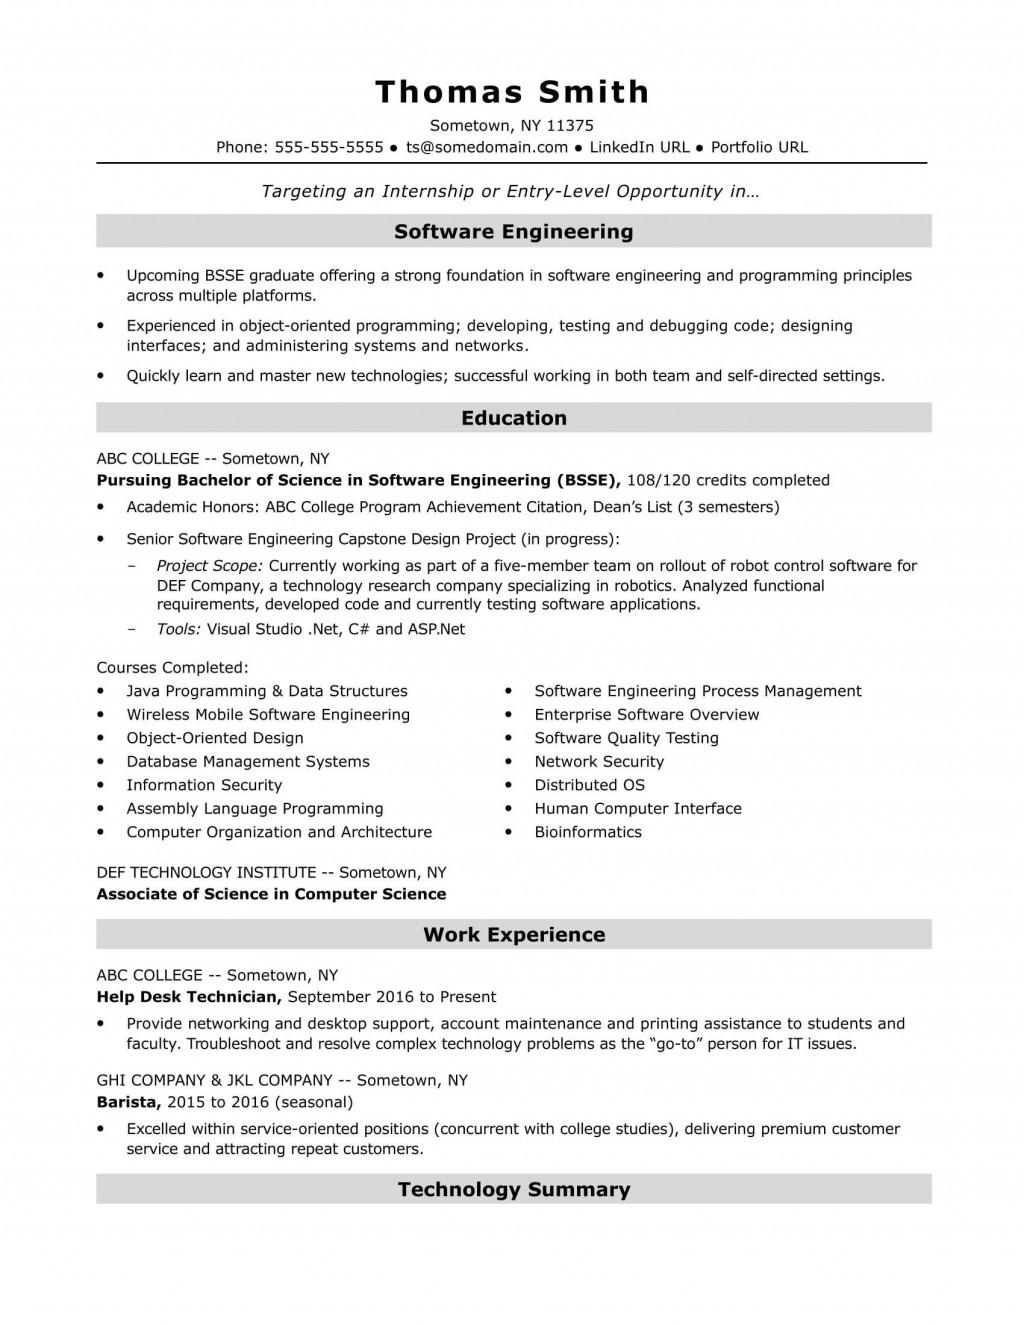 002 Awesome Software Engineering Resume Template Image  Engineer Microsoft Word Cv Free Developer DownloadLarge